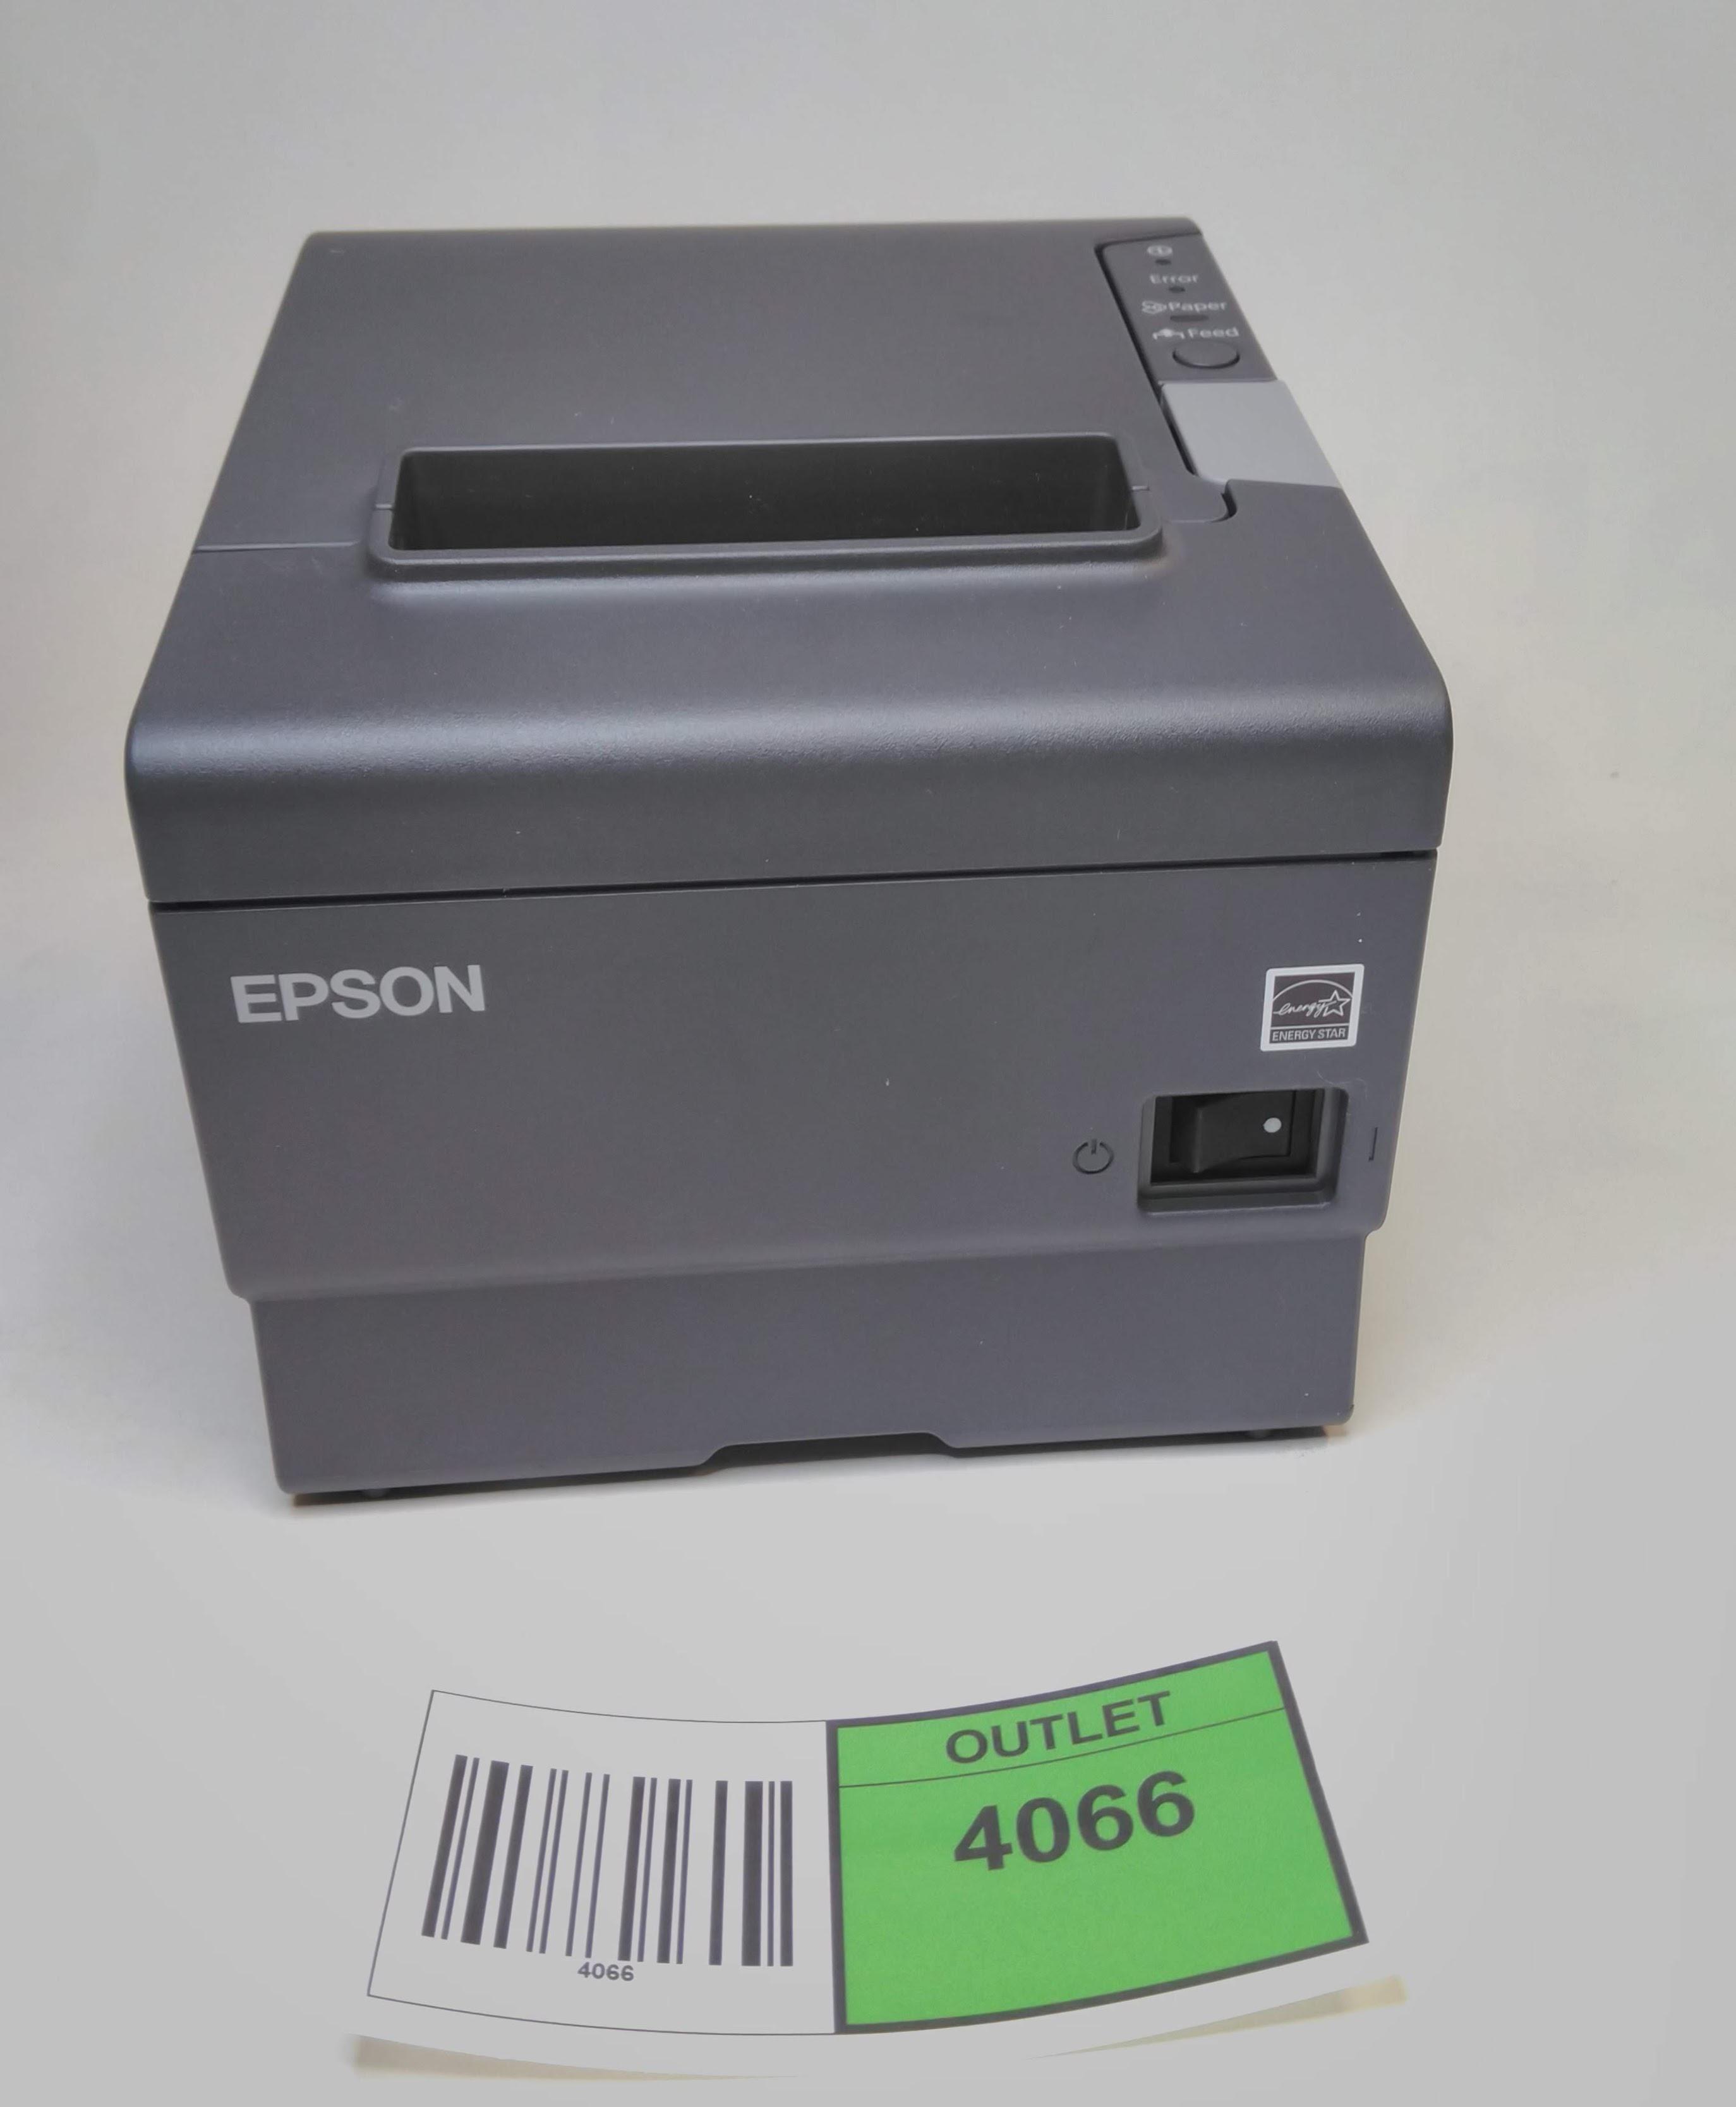 Epson TM-T88V C31CA85084 Image 1